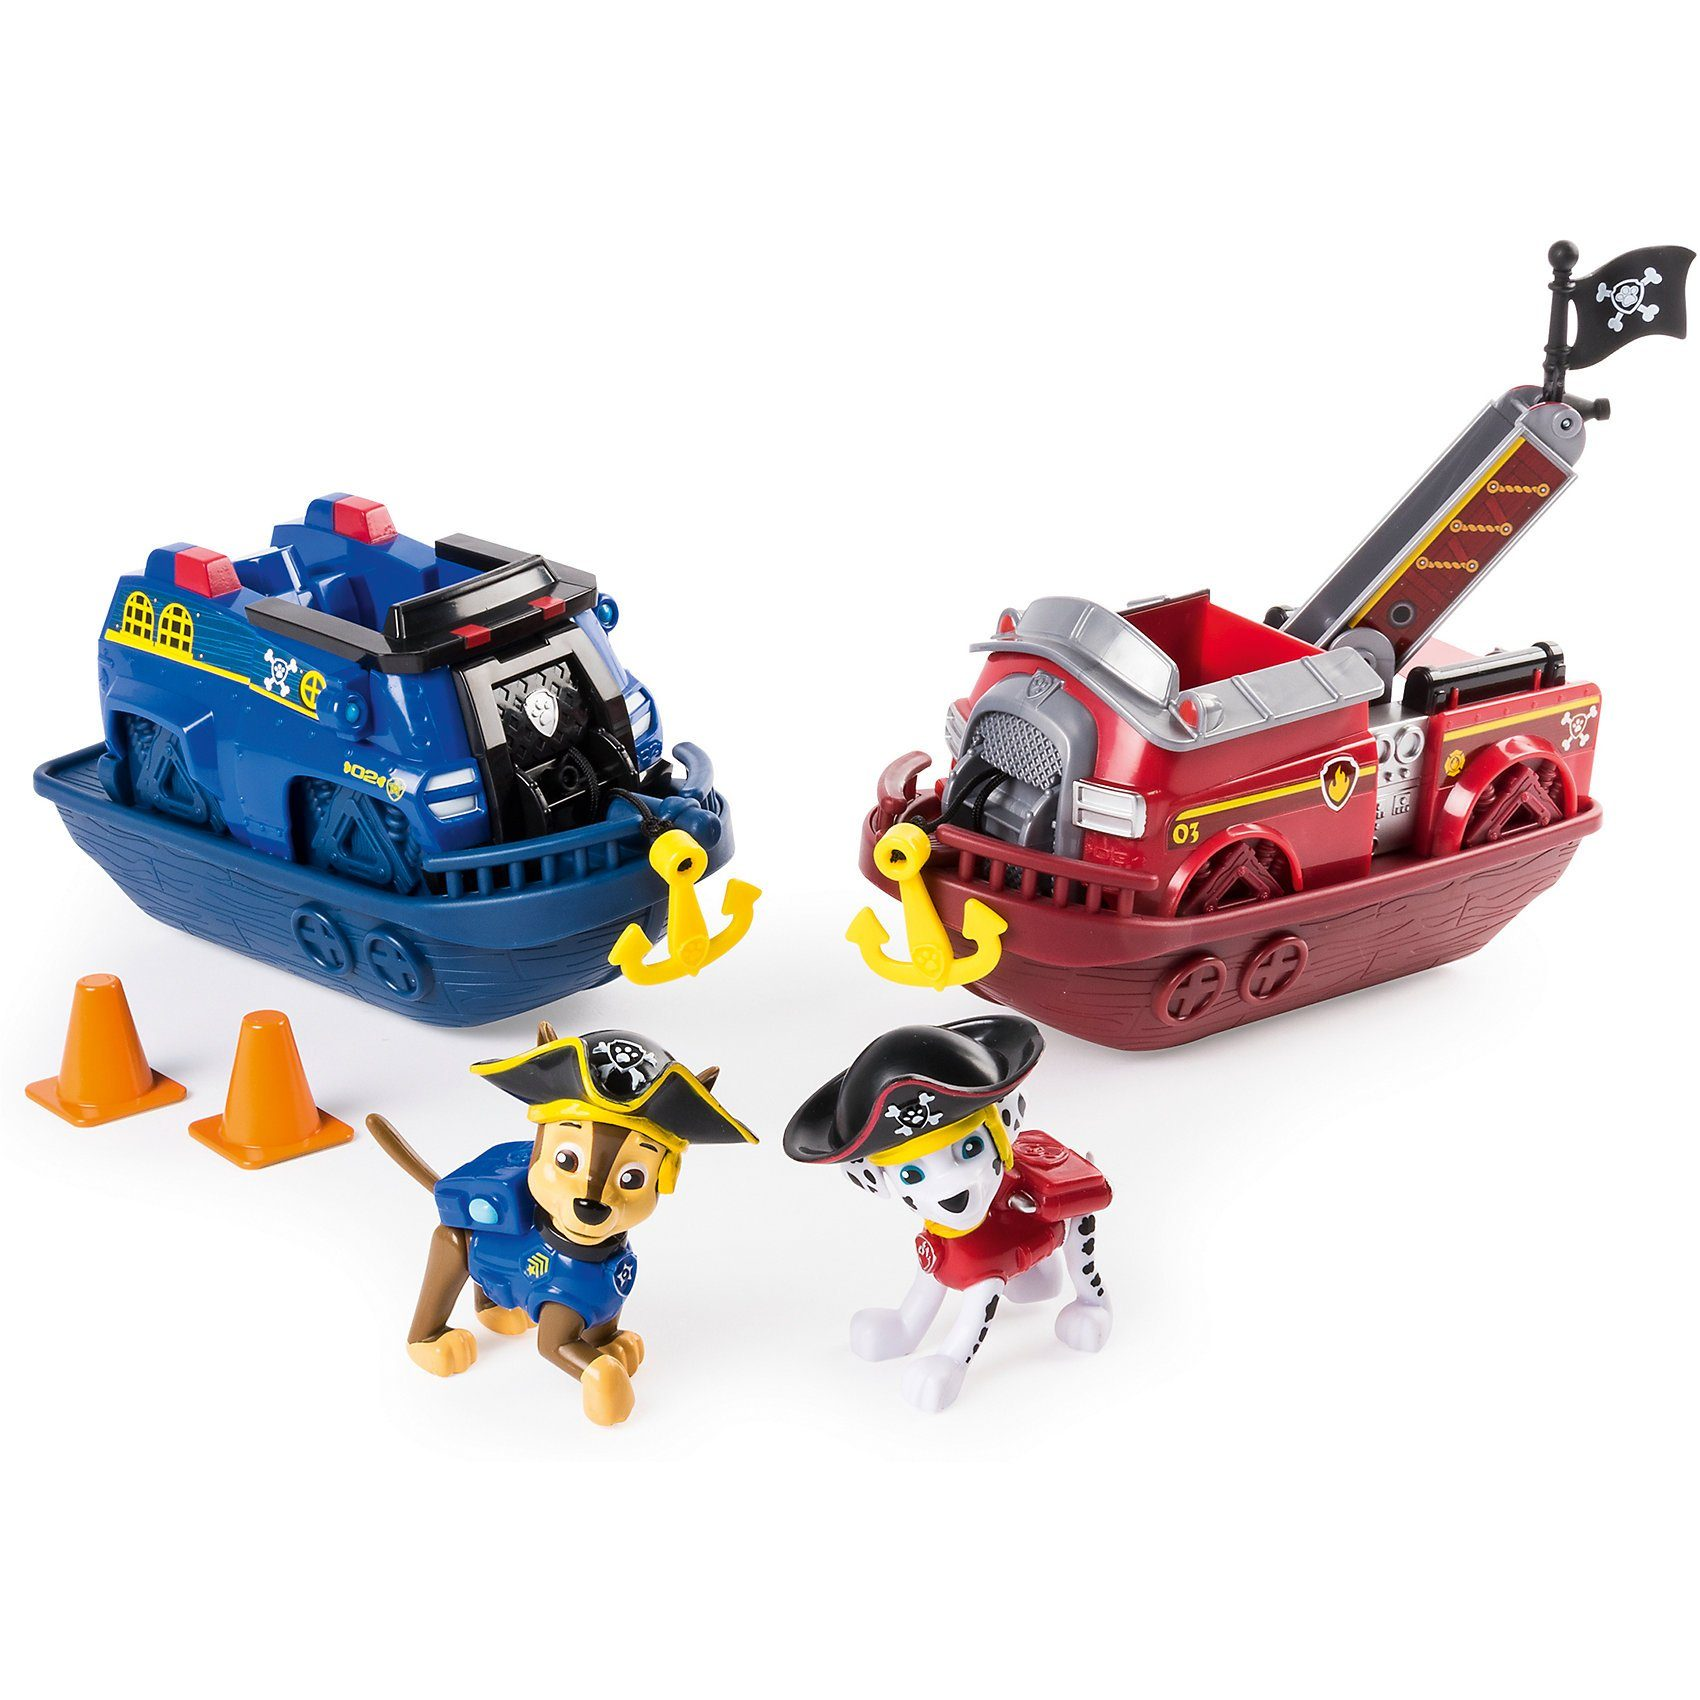 Spin Master Sea Patrol Piraten Fahrzeuge Set Chase und Marshall